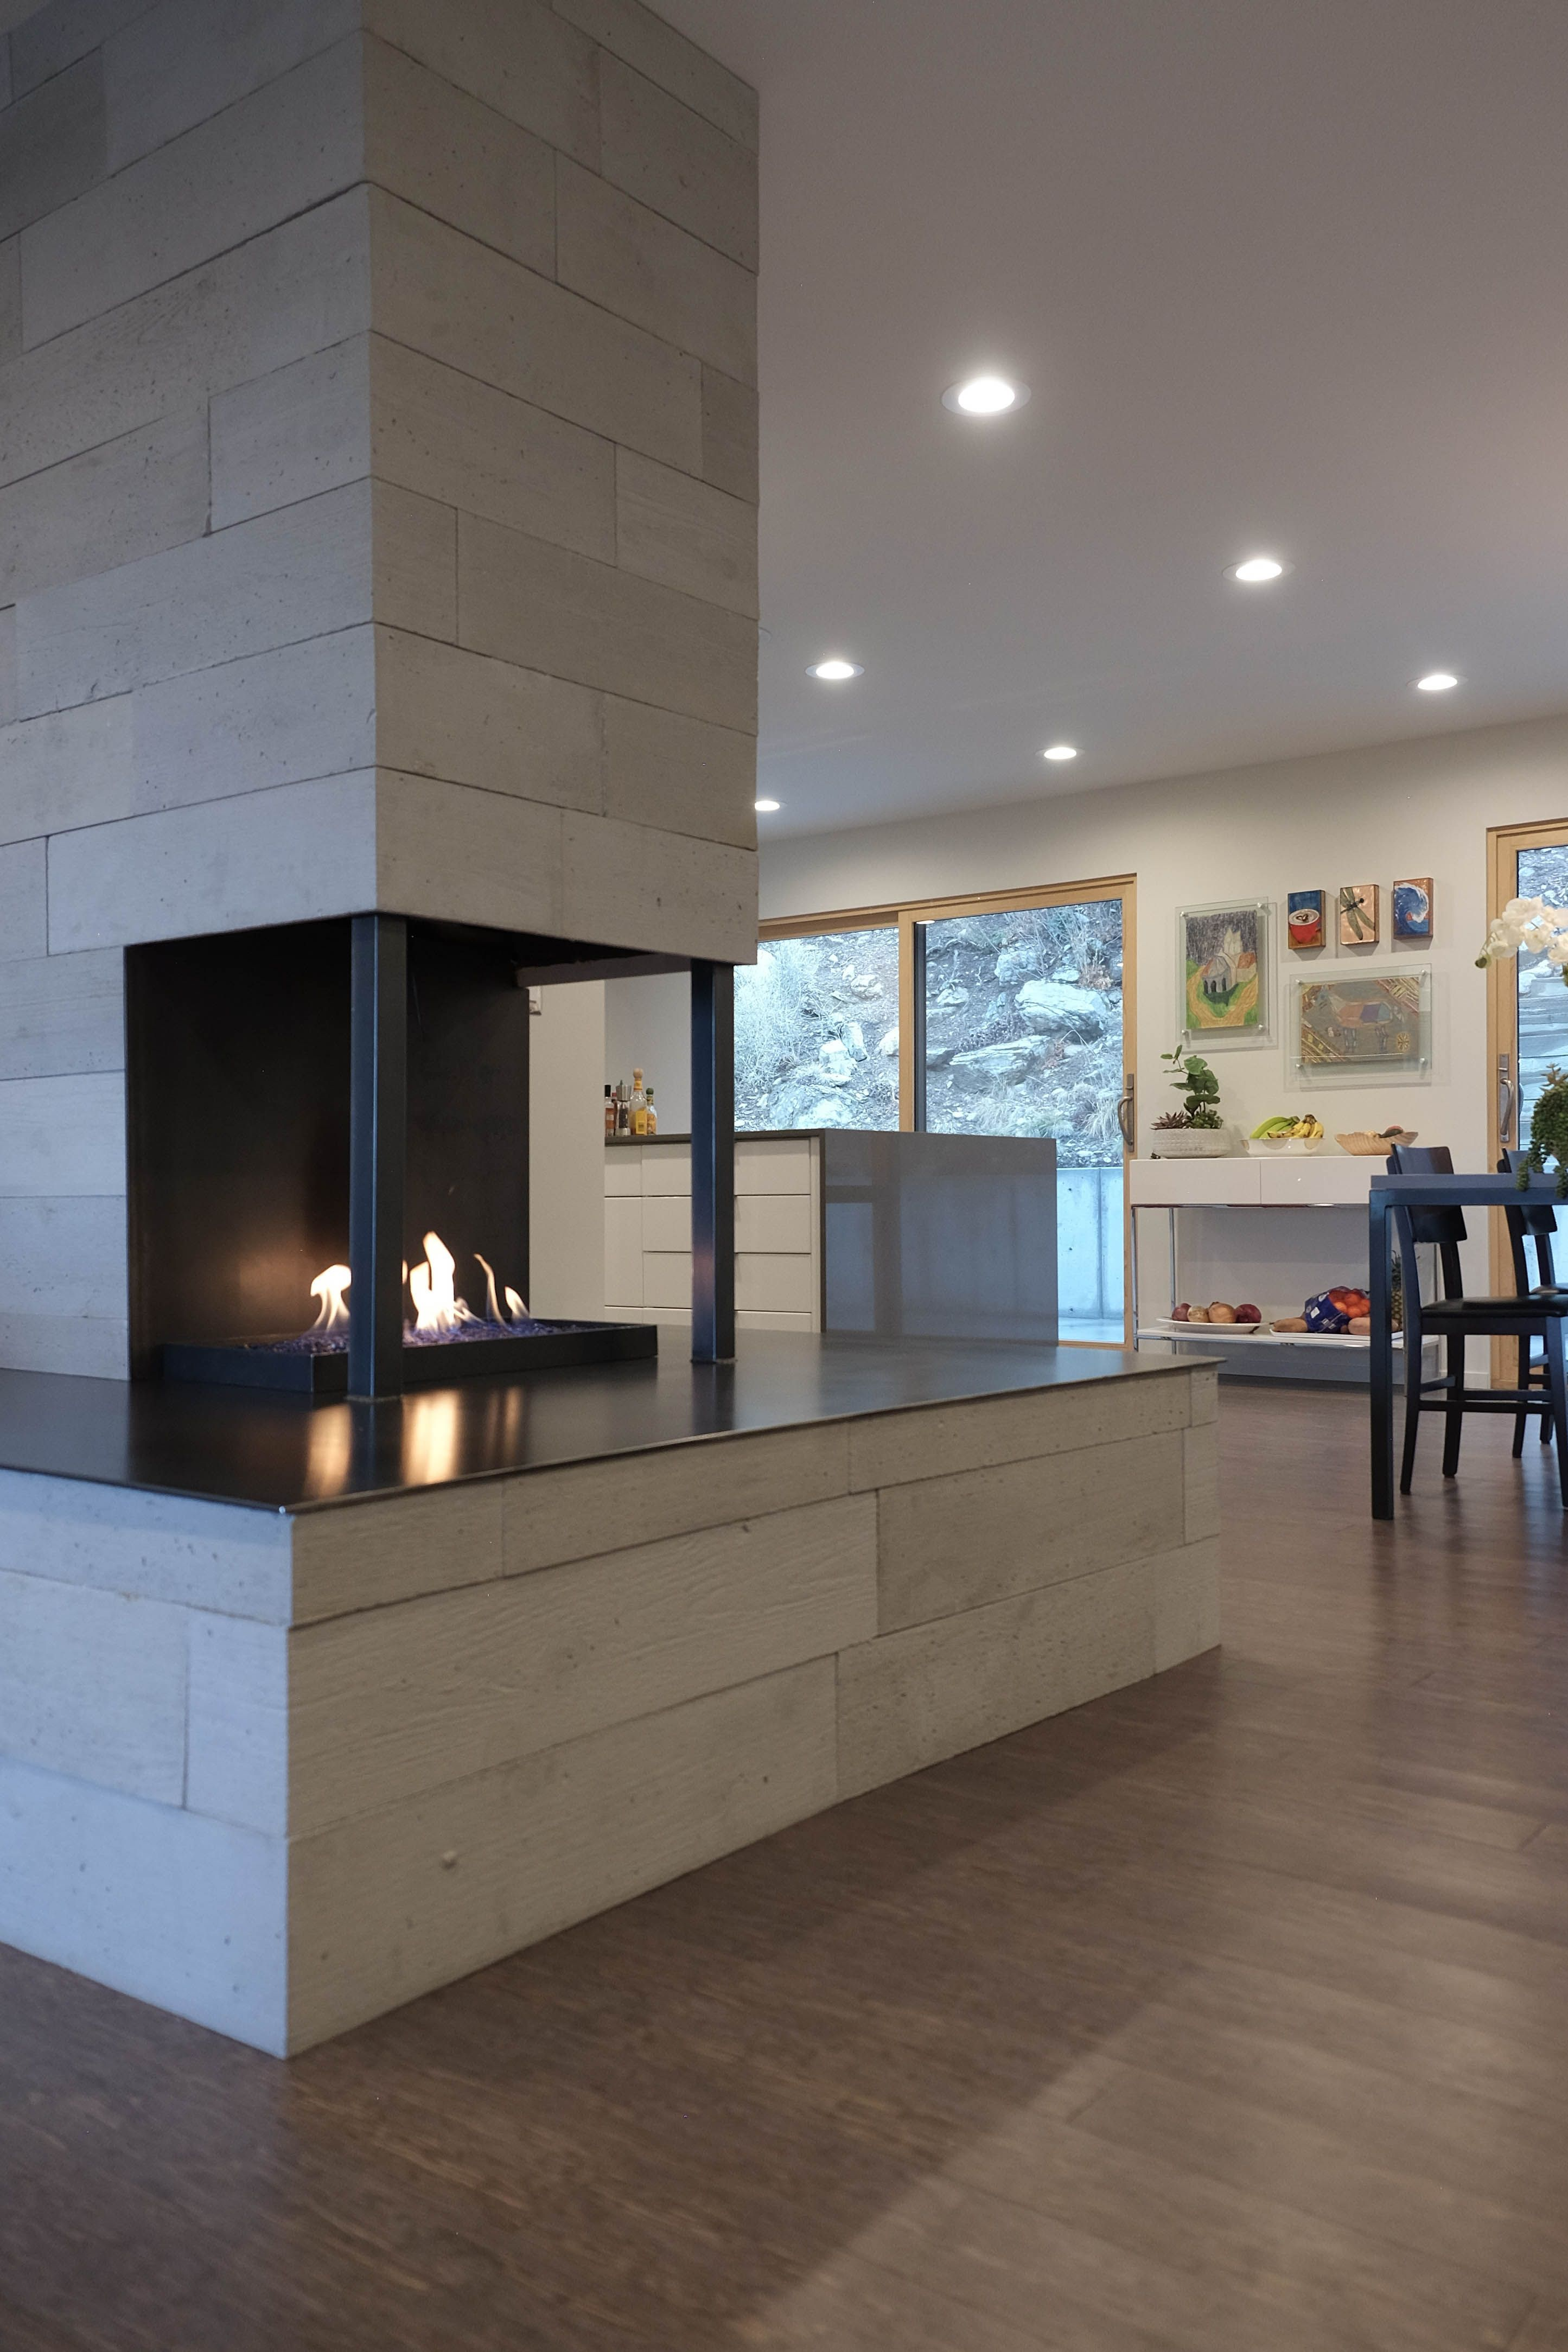 Wunderbar Küchenboden Design Software Ideen - Küchenschrank Ideen ...